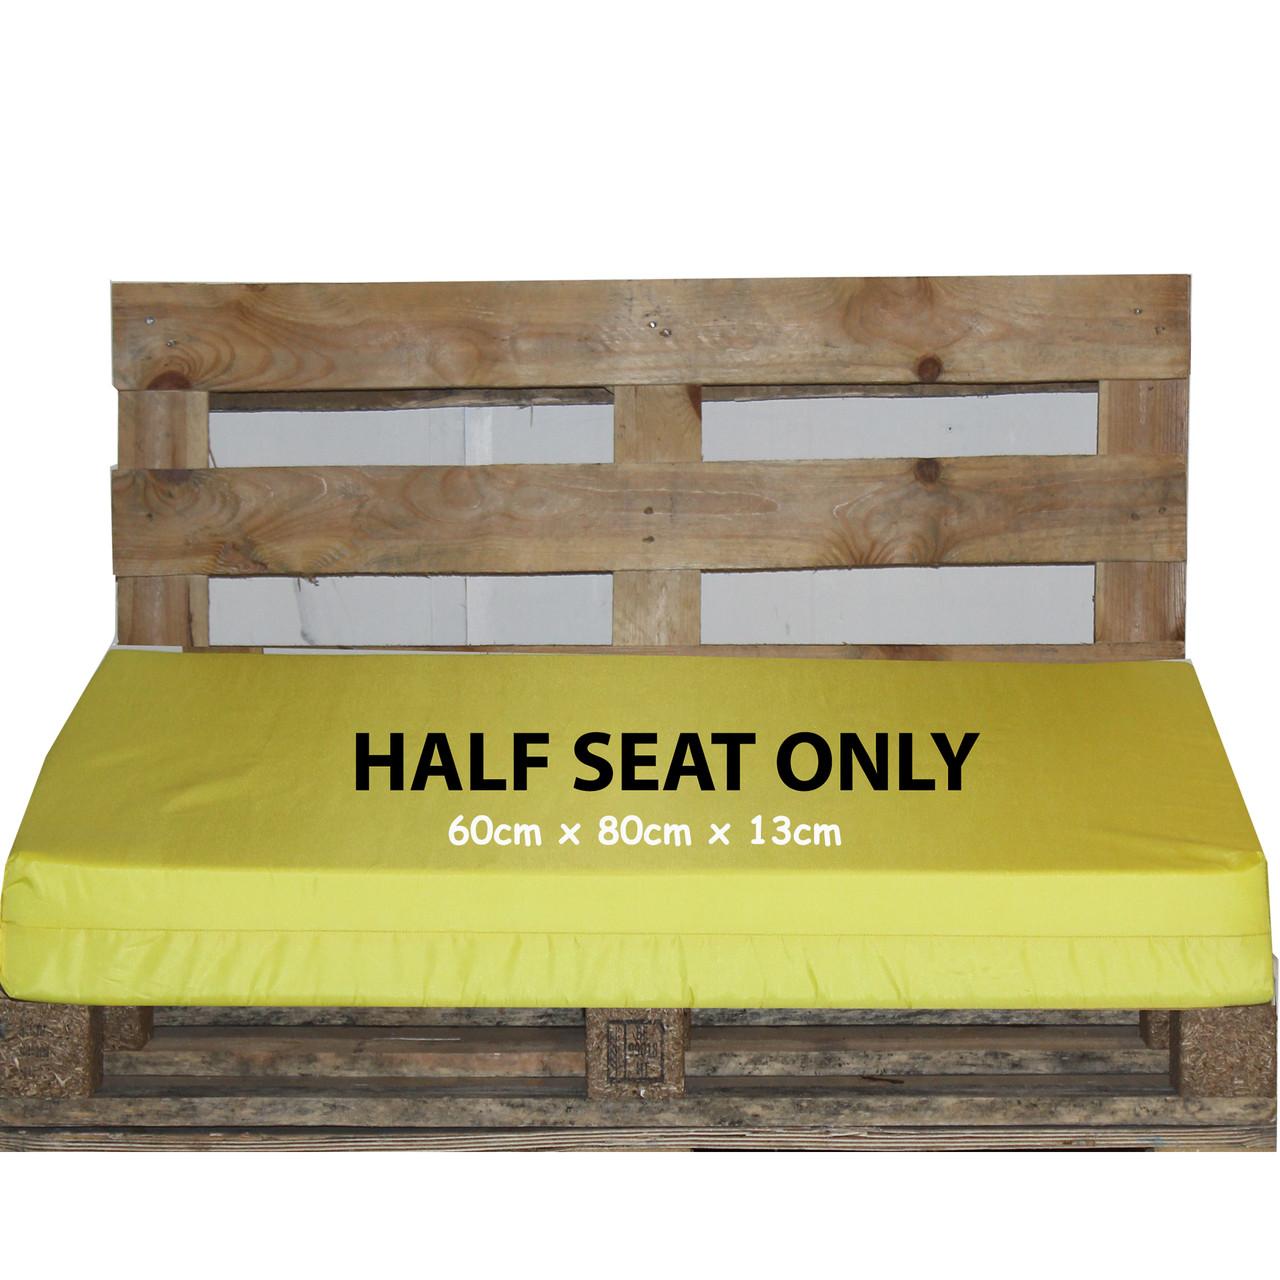 Kosipad Yellow pallet garden furniture cushions for Euro Pallets